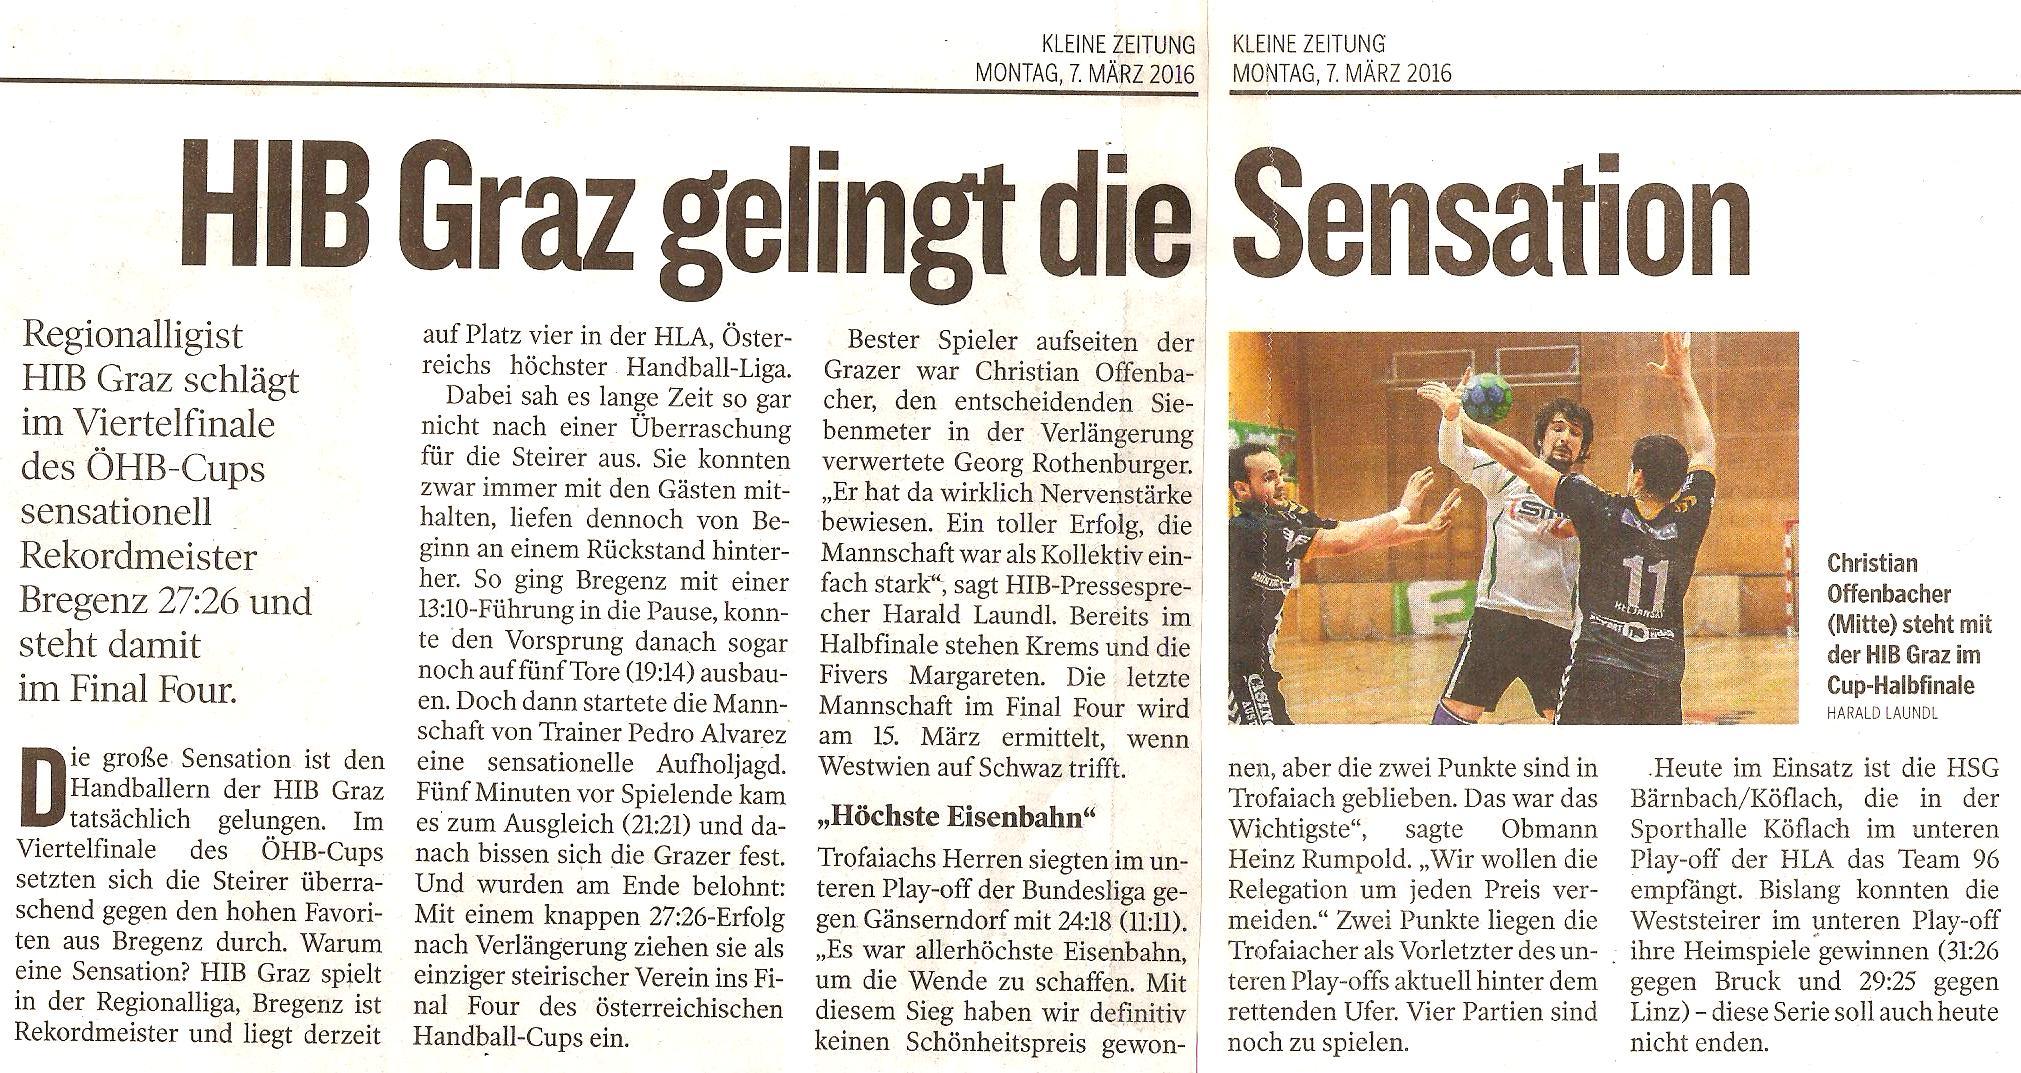 2016-03-07 HIB-Handball Kl.Ztg.